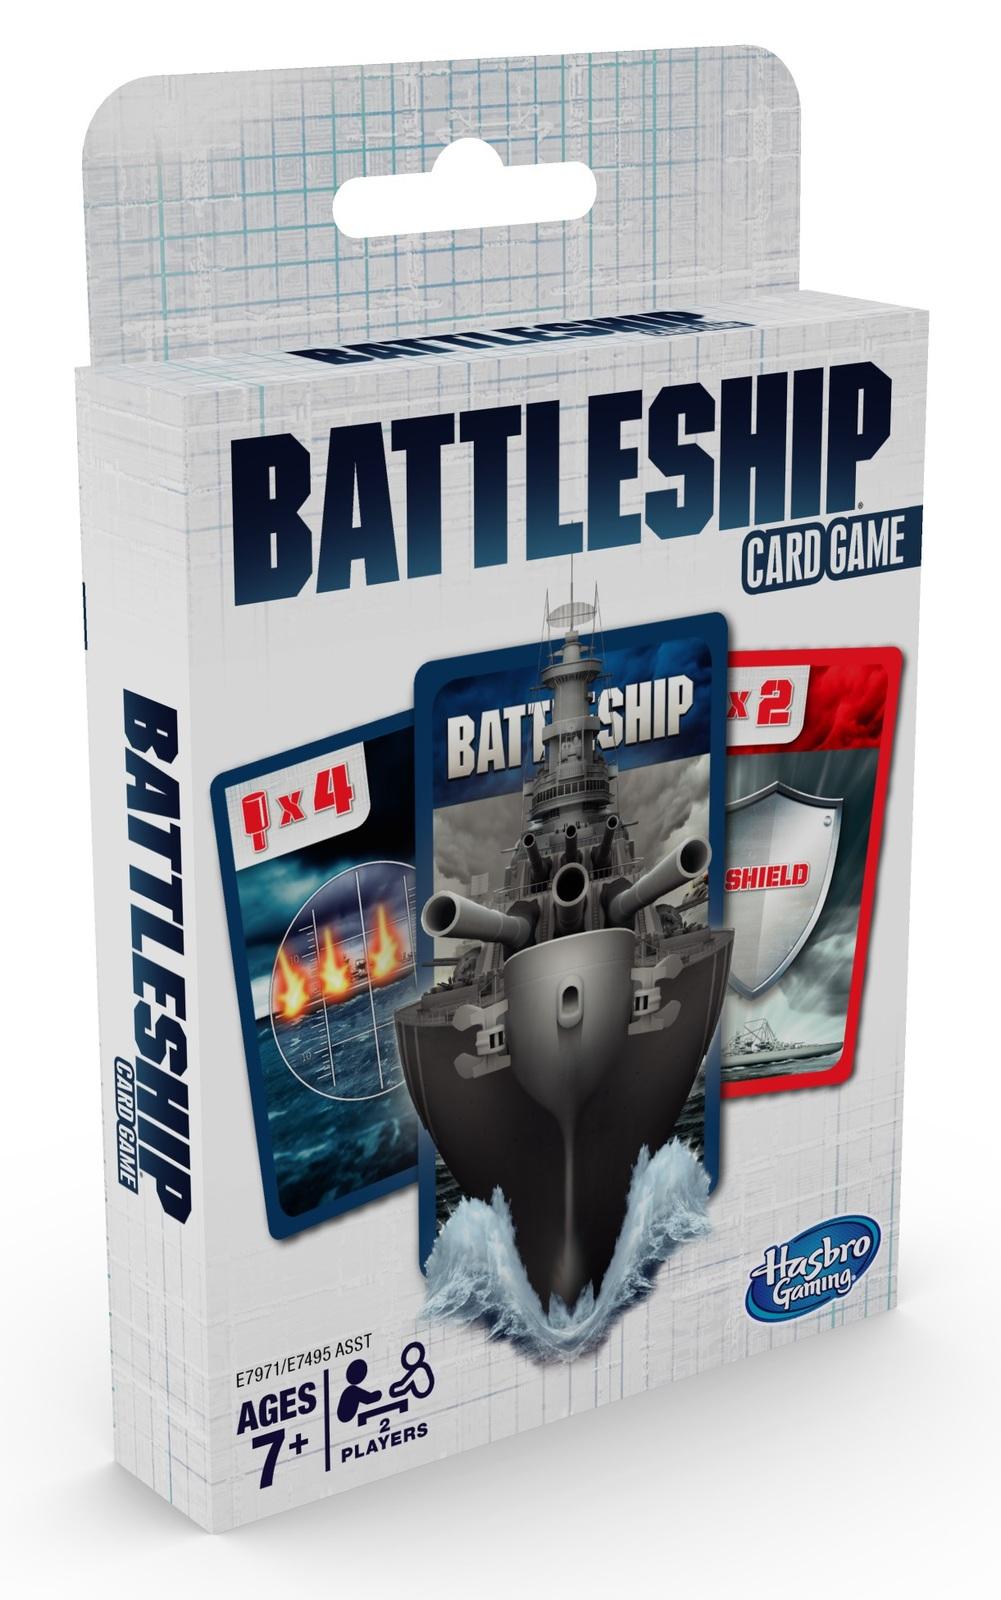 Battleship - The Card Game image